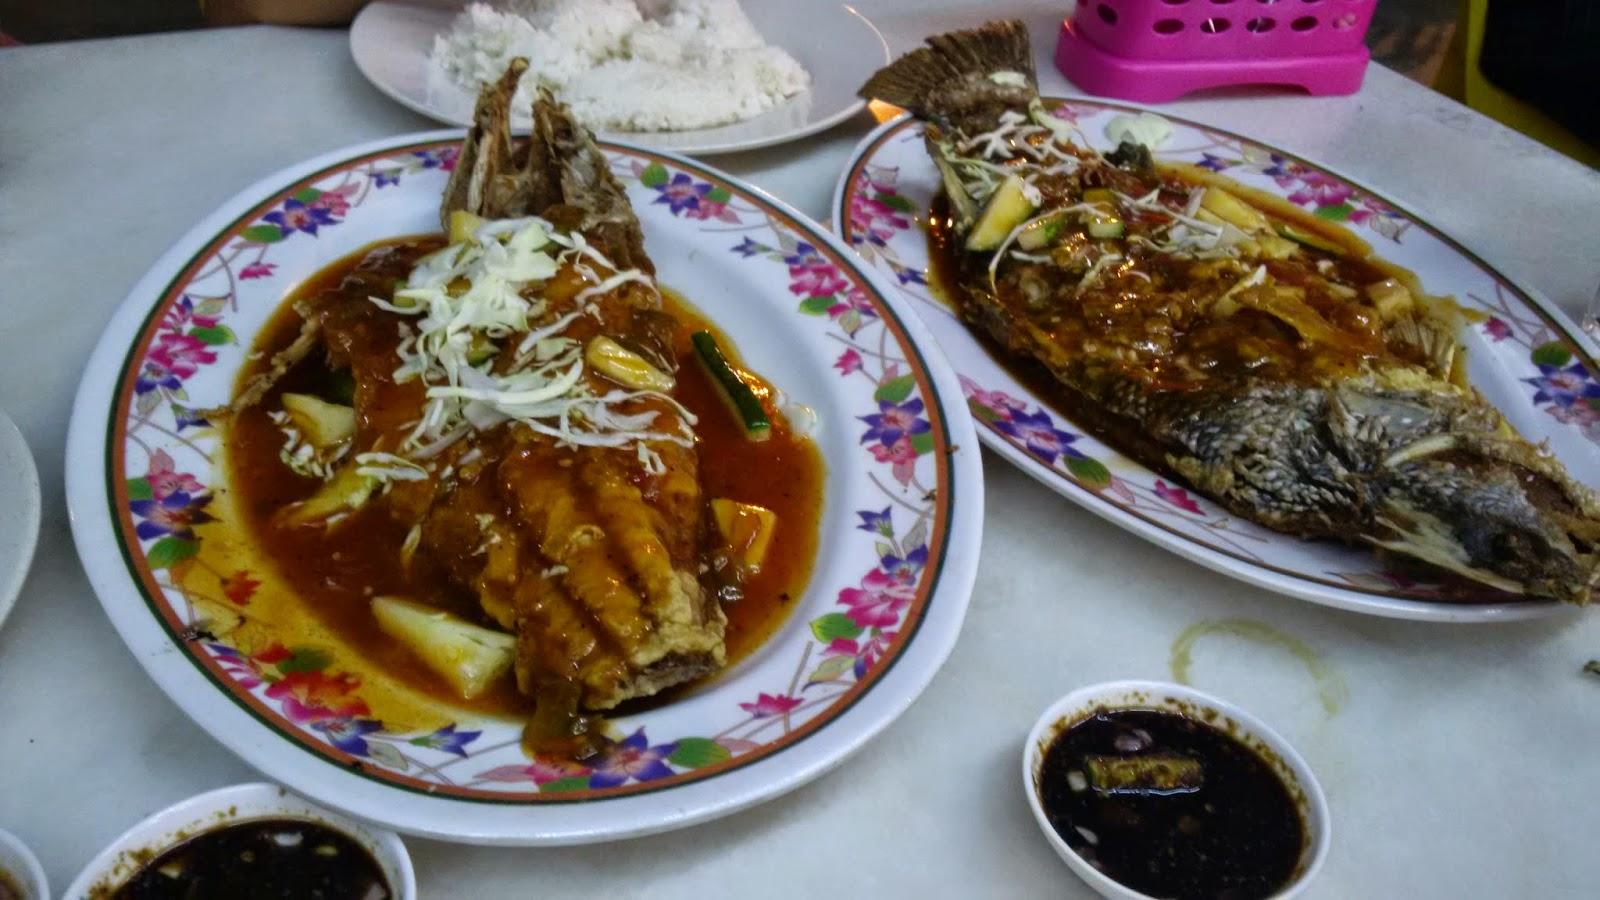 "best restaurants melaka, asam pedas melaka, ""malaysia travel influencer,  malaysia influencer,  blog with cris,  malaysia blogger,  malaysia freelance model,  what to eat in melaka halal,  melaka chinese restaurant,  melaka food blog 2019,  melaka food blog 2018,  late night supper in melaka,  malacca must buy snacks,  melaka raya food,  best cendol in melaka,  best cendol in melaka,  best halal food in melaka,  best nyonya food in melaka,  melaka snacks,  satay celup melaka,  melaka traditional food,  romantic dinner in melaka,  malacca must buy snacks,  melaka famous place,  what to eat in melaka halal,  malacca river restaurant,  seafood near jonker street,  durian shake melaka,  melaka tong shui,  melaka crab,  wild coriander melaka menu,  chinese restaurant in melaka,  bulldog melaka,  teatime melaka,  melaka lobak,  taman asean melaka food,  pork noodle melaka,  food near melaka sentral,  batu berendam food,  melaka off the beaten track,  best seafood in melaka town,  hidden places in melaka,  soon yen duck noodle,  best food near mahkota parade,  must try halal food in melaka,  melaka must eat nyonya food,  hakka zhan restaurant blog,  melaka blogspot 2019,  heng hong tin kee,  baba charlie cafe review,  melaka bunga raya popiah,  hock chin melaka,  ikan bakar umbai melaka,  menu ikan bakar parameswara,  ikan bakar umbai melaka harga,  ikan bakar haji musa,  umbai ikan bakar melaka map,  ikan bakar muara sg melaka,  ikan bakar malim,  ikan bakar bandar hilir,  ikan bakar haji musa,  ikan bakar malim,  resepi ikan bakar melaka,  medan selera melaka,  ikan bakar muar,  butter prawn sedap di melaka,  ikan bakar padang temu melaka,  umbai seafood malacca malaysia,  ikan bakar daun pisang melaka,  muara ikan bakar,  ikan bakar batu berendam,  ikan bakar alor gajah,  portuguese settlement stall 7,  portuguese settlement which stall,  umbai grill fish,  ikan bakar parameswara 2019,  restoran cerana ikan bakar alai,  mukmin seafood melaka,  ala kassim,  menu ikan bak"